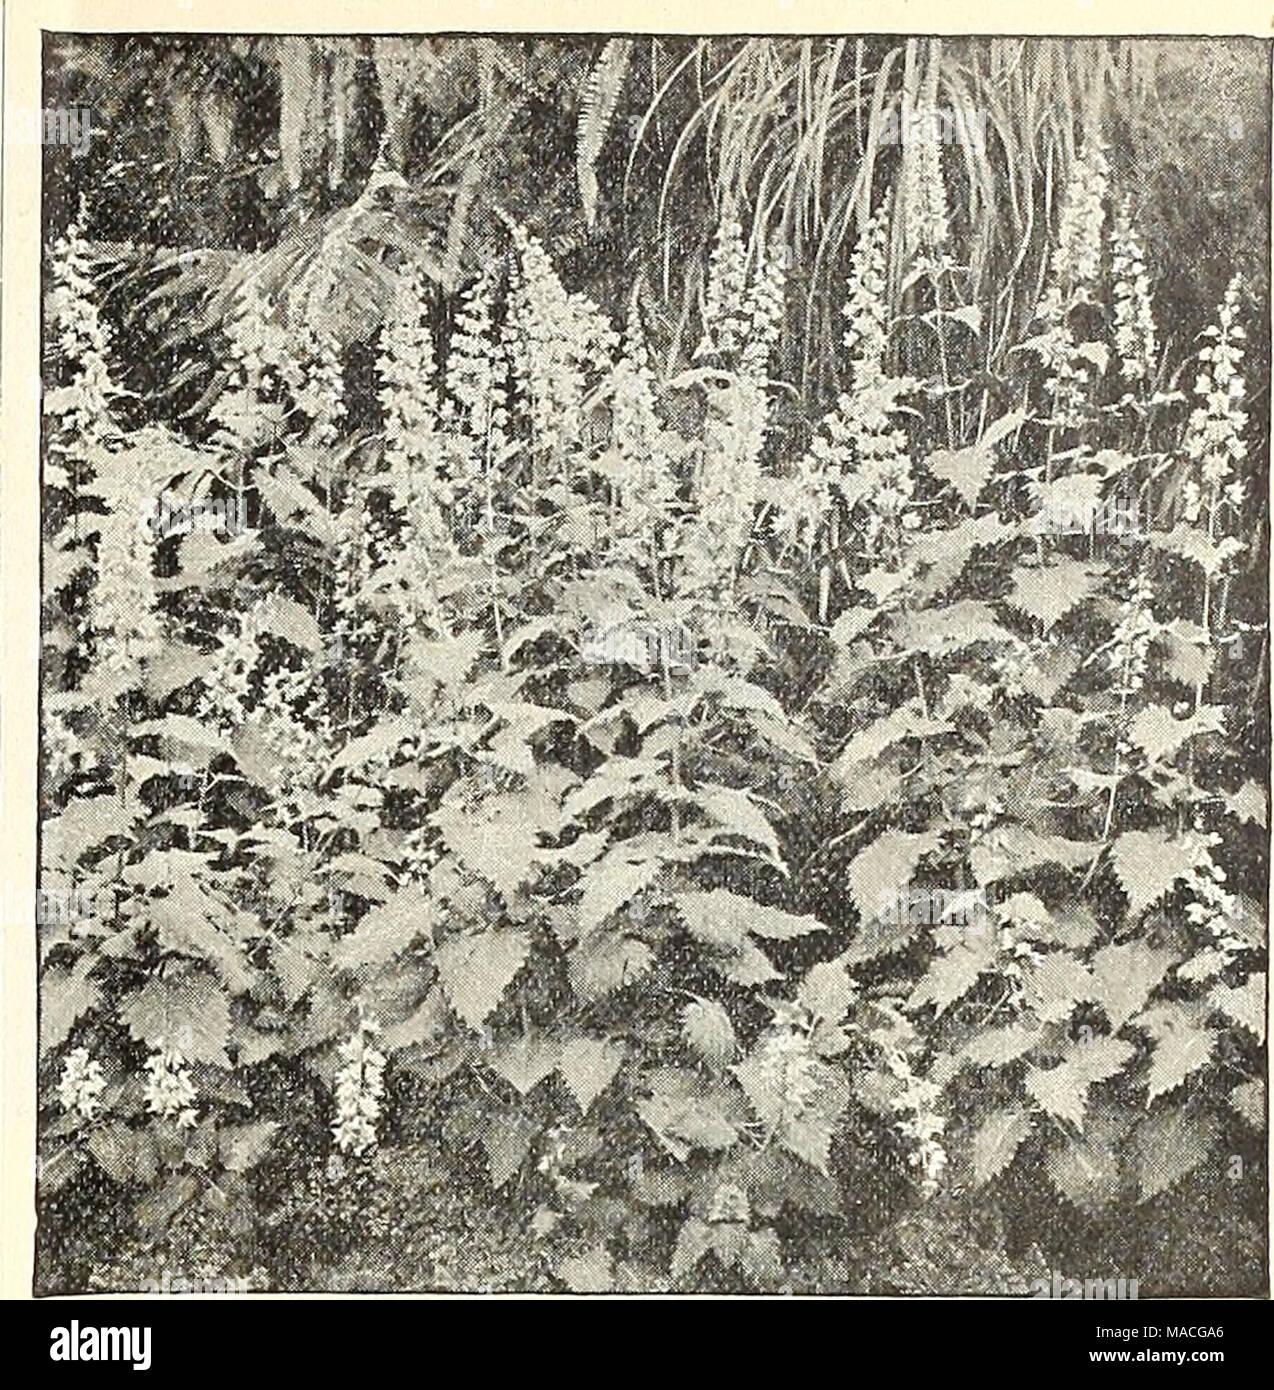 ". Dreer's wholesale price list summer edition 1902 July to August : seasonable flower and vegetable seeds, fertilizers, tools, etc., etc . COLEUS THYRSOIDEUS. Miscellaneous Begonias. Per doz. Per 100 Argentea Guttata. 3-inch pots . . $0 75 $6 00 Alba Picta. 3-inch pots 75 6 00 liaageana. "" "" 1 00 8 00 Metallica. "" "" 75 6 00 Thurstoni. "" "" 75 6 00 Rex, in 12 varieties. 3-inch pots .... I 00 8 00 Bongainvillea Glabra Sanderiana. A fine lot in 4-inch pots of this useful plant. $2.00 per dozen ; $15.00 per 100. Fancy-Leaved Caladinms. A choice collection of 50 varieti Stock Photo"